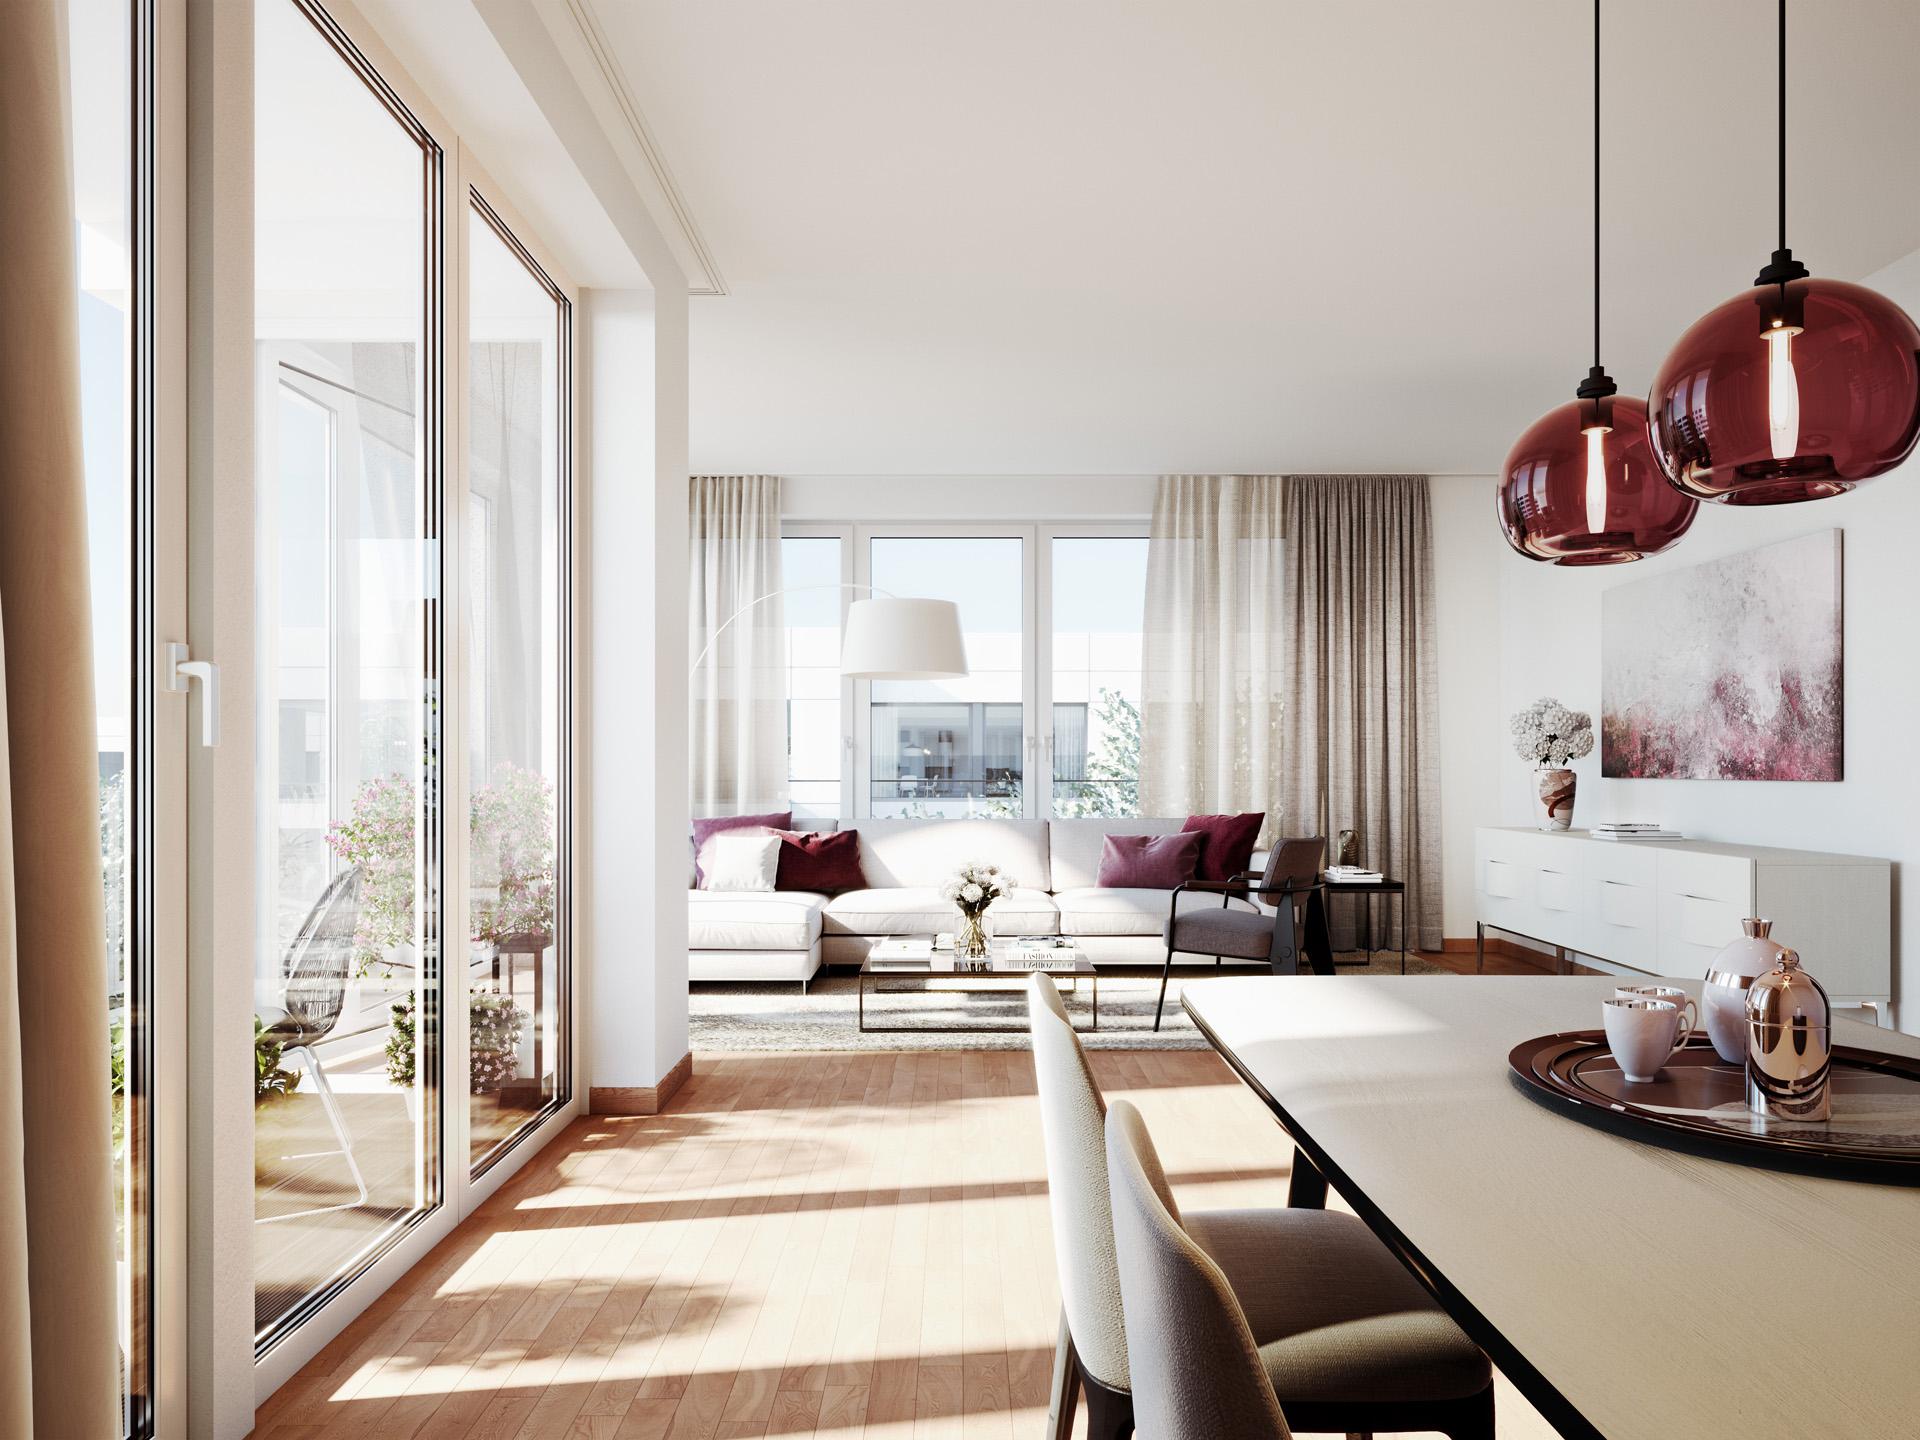 Maximilians quartier architekturvisualisierung xoio - Architekturvisualisierung berlin ...